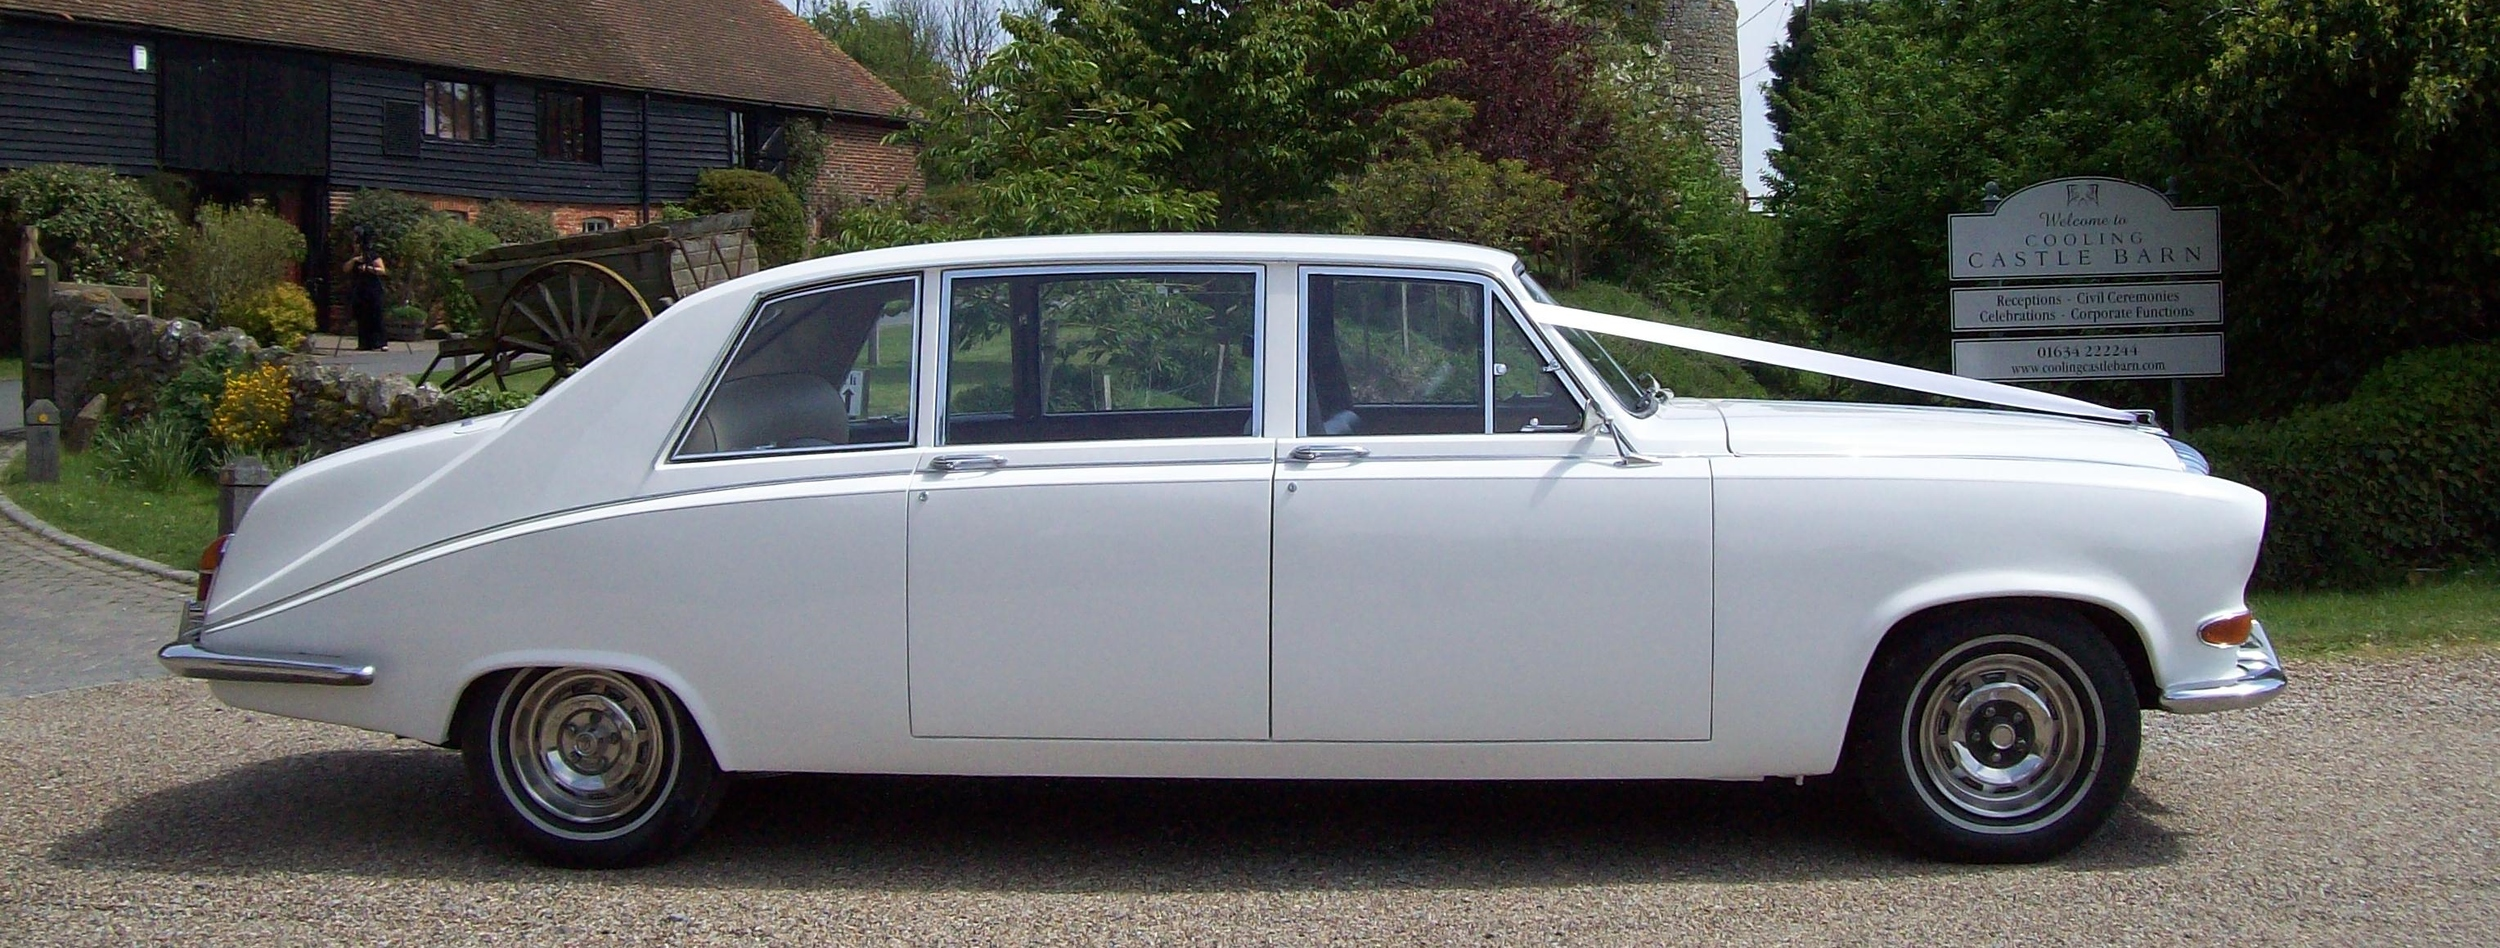 White Daimler DS 7/8 seat Limousine